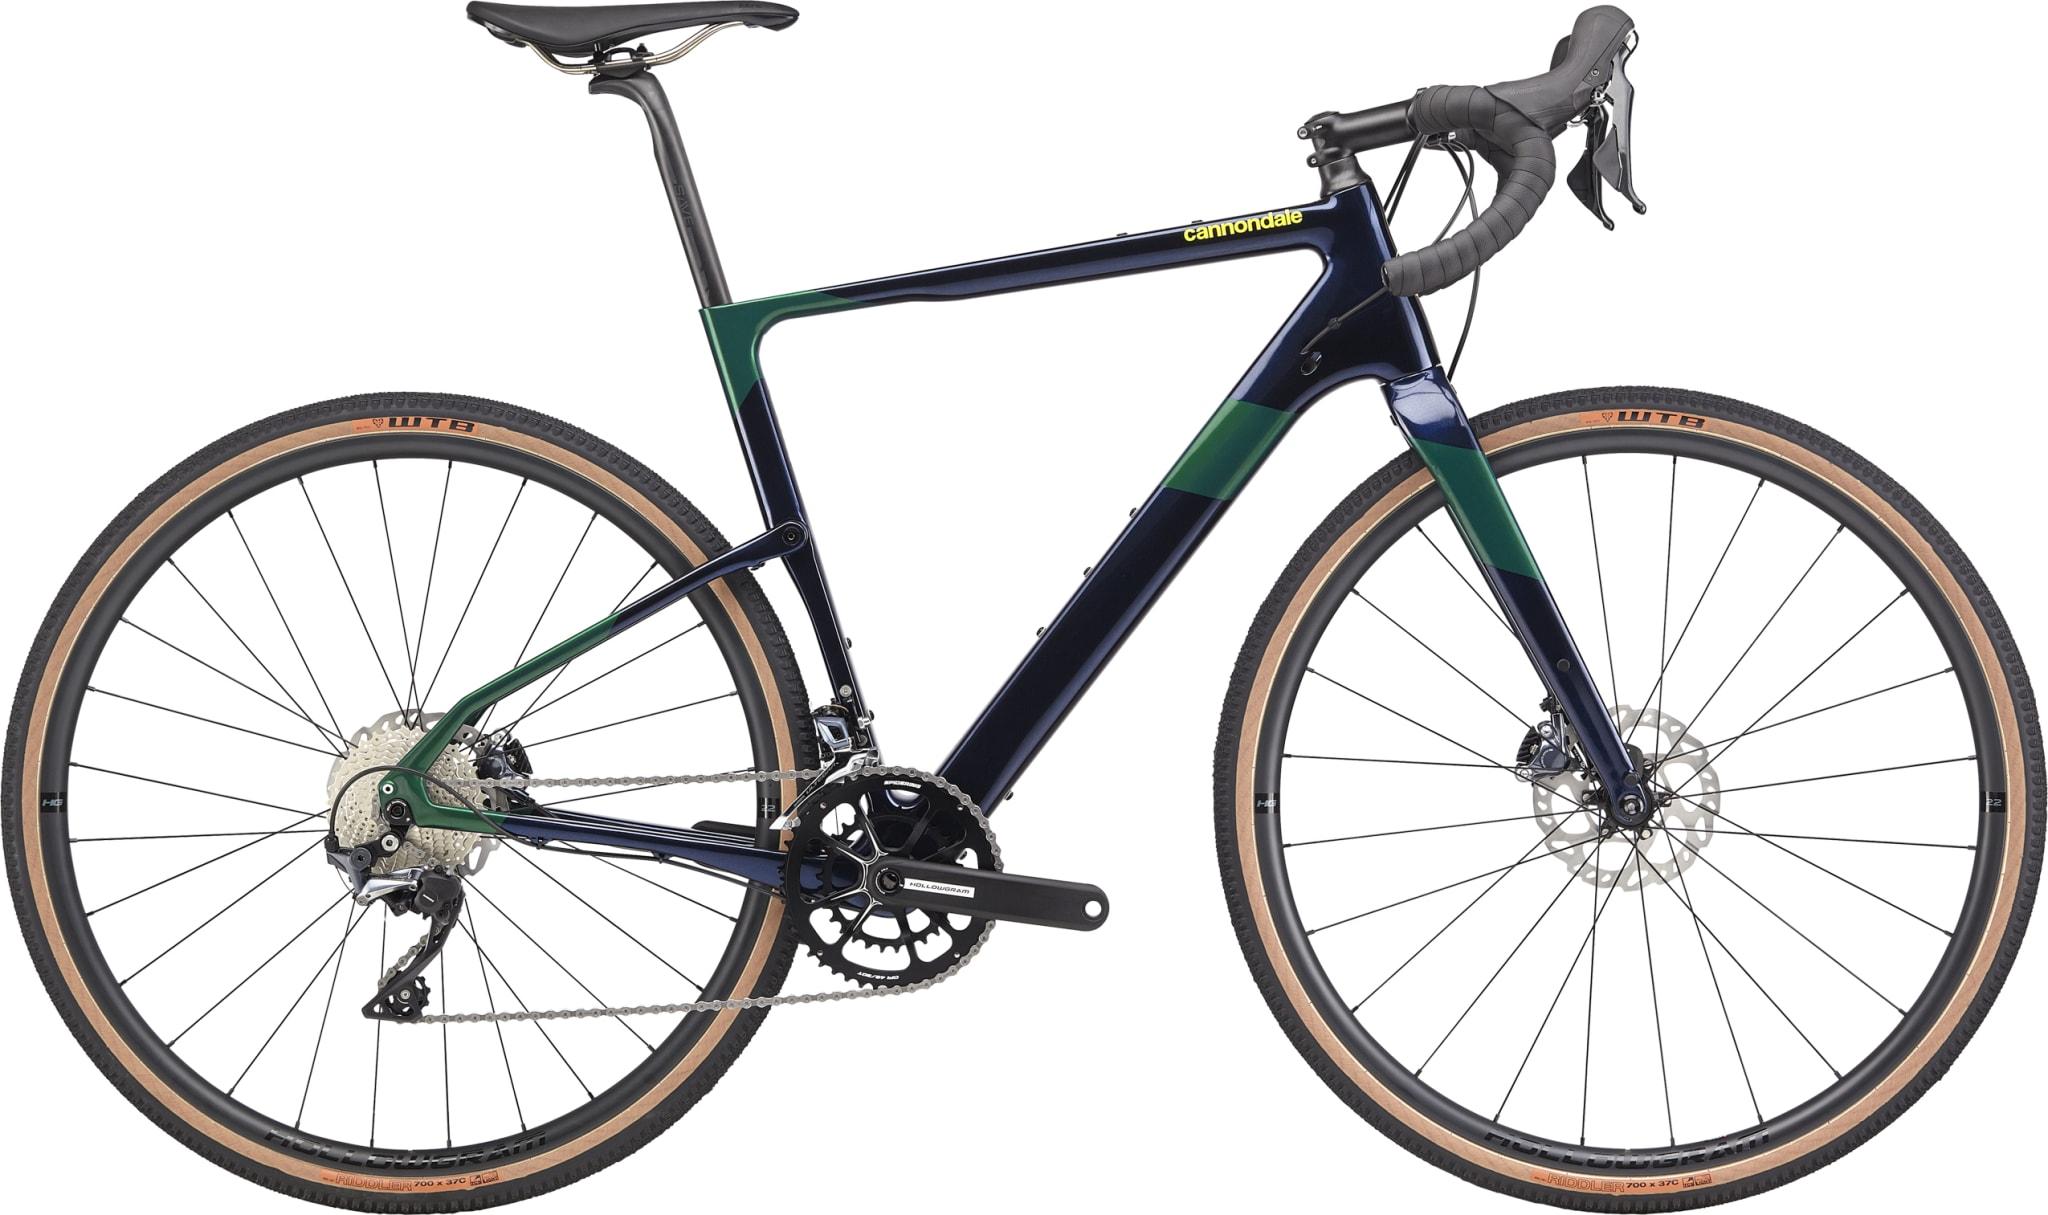 Topstone Carbon Ultegra RX 2020